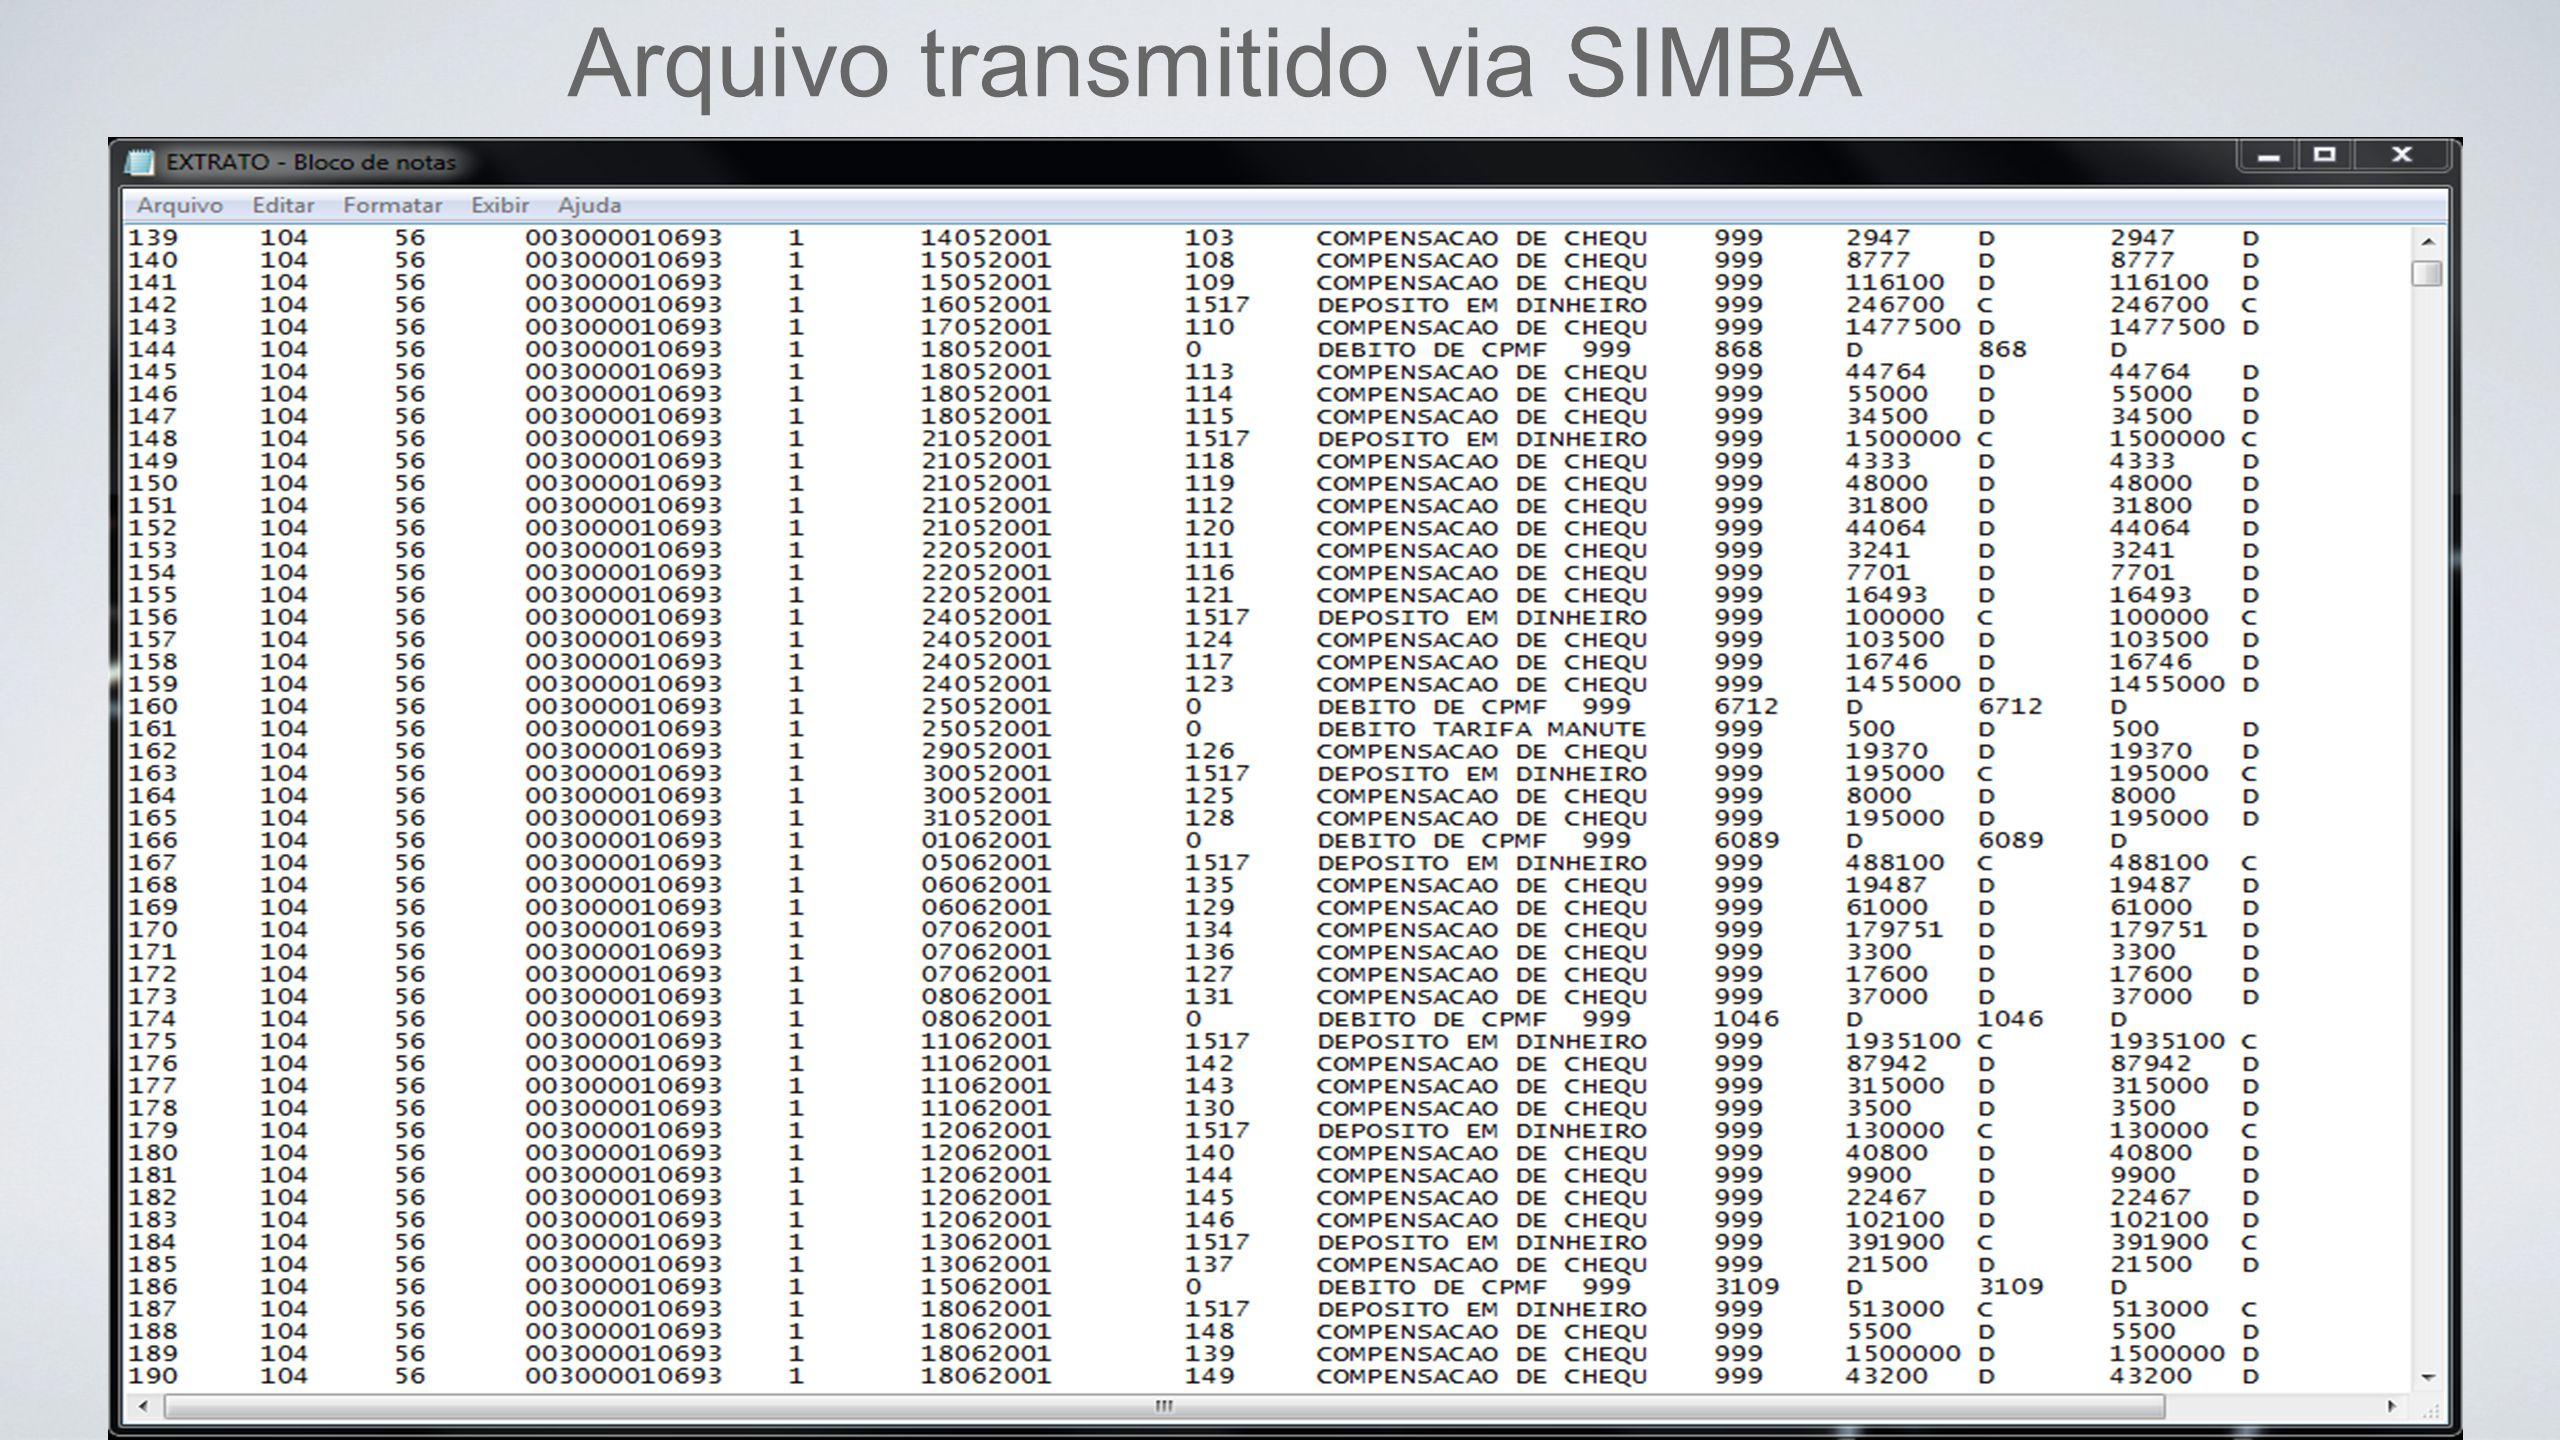 Arquivo transmitido via SIMBA